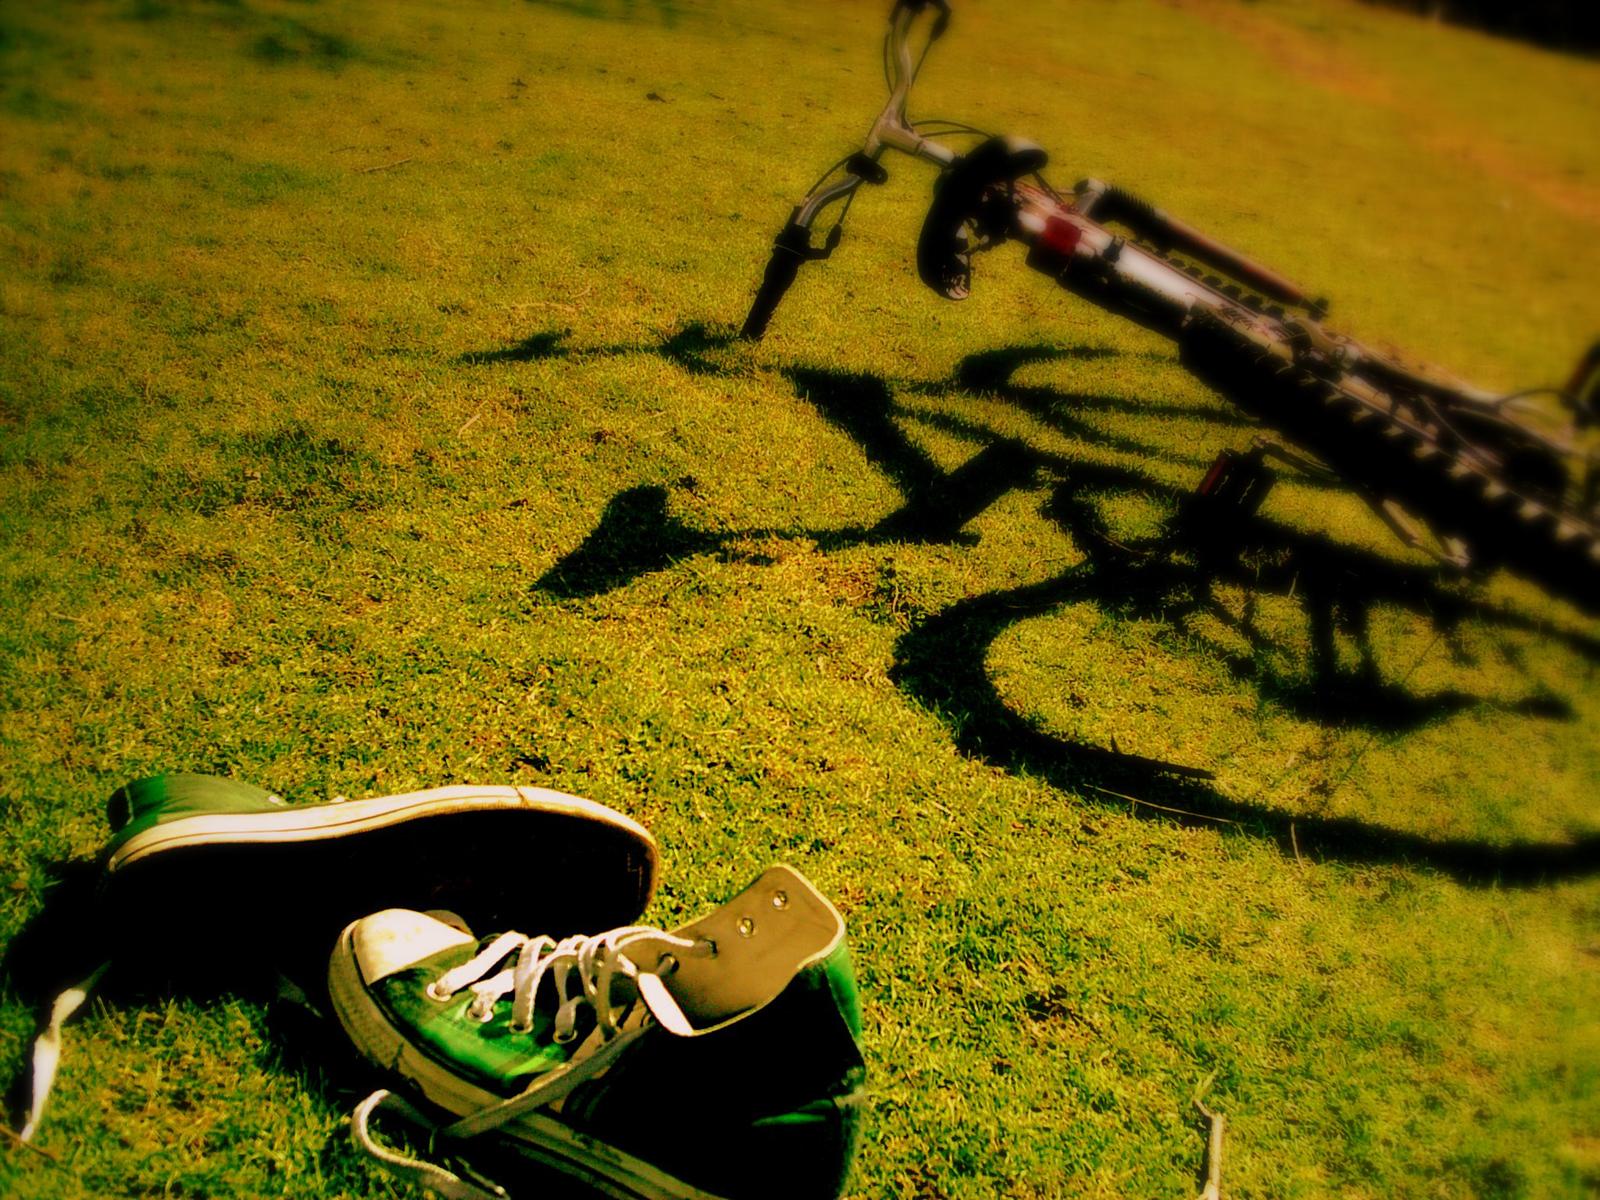 1600x1200 Bike and shoes desktop PC and Mac wallpaper 1600x1200